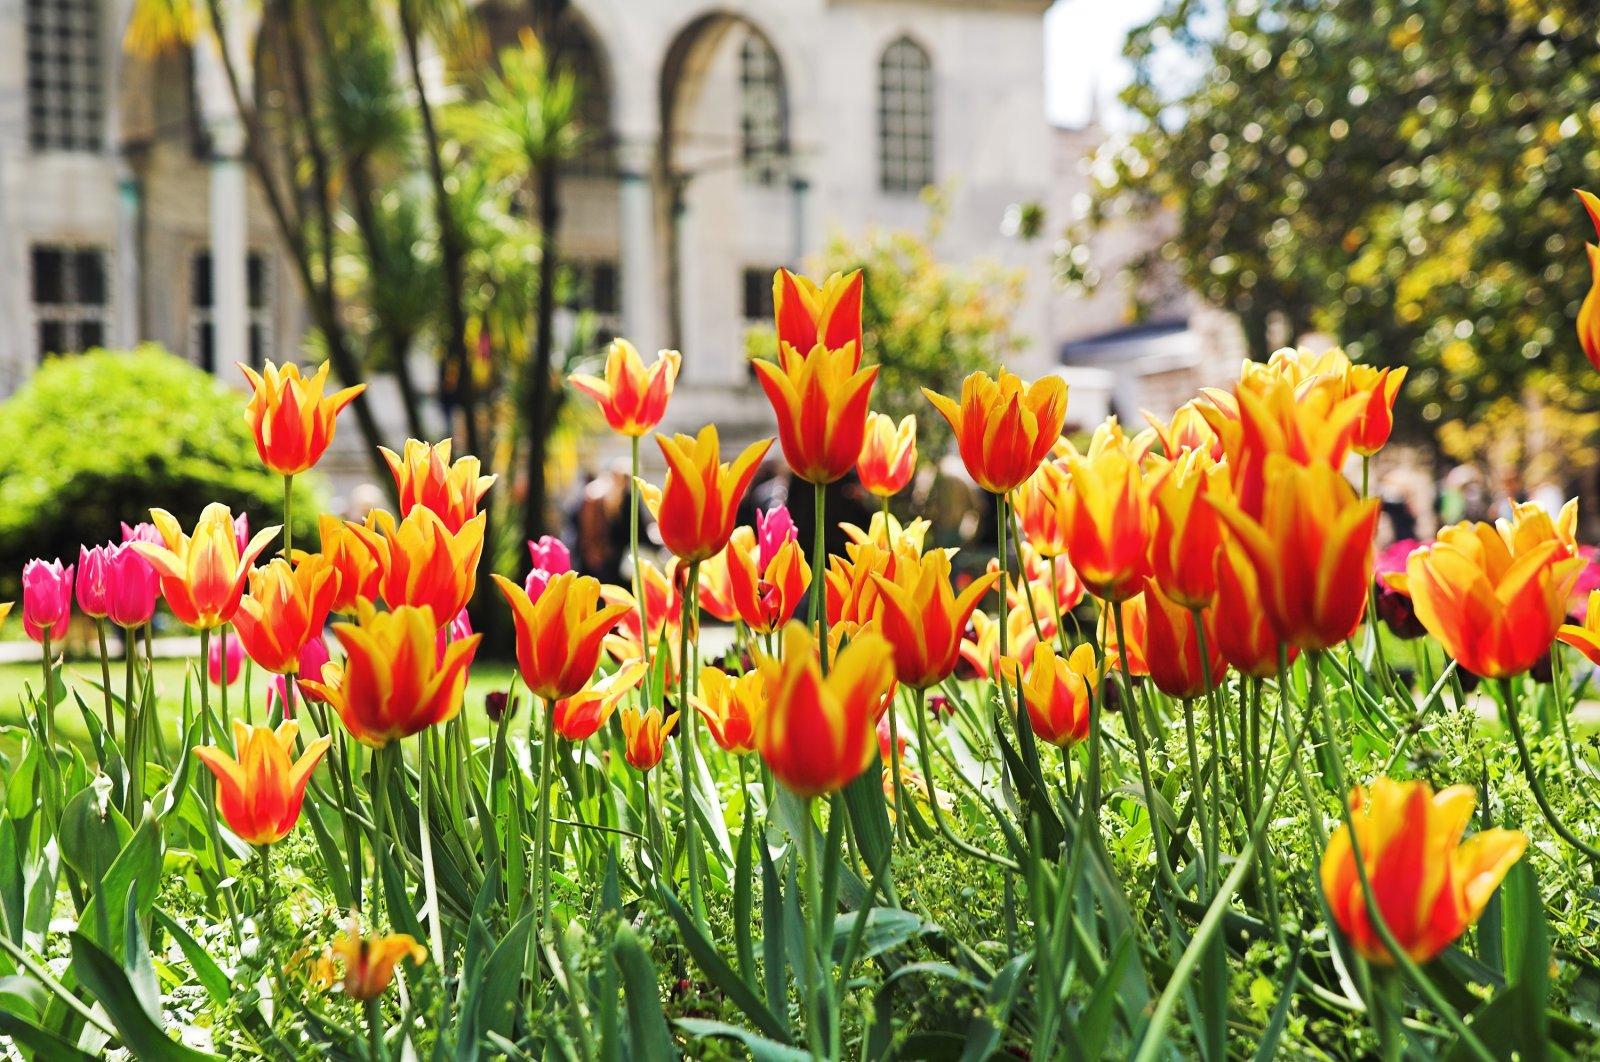 Tulips adorn a garden at the Topkapı Palace, Istanbul, Turkey. (Shutterstock Photo)